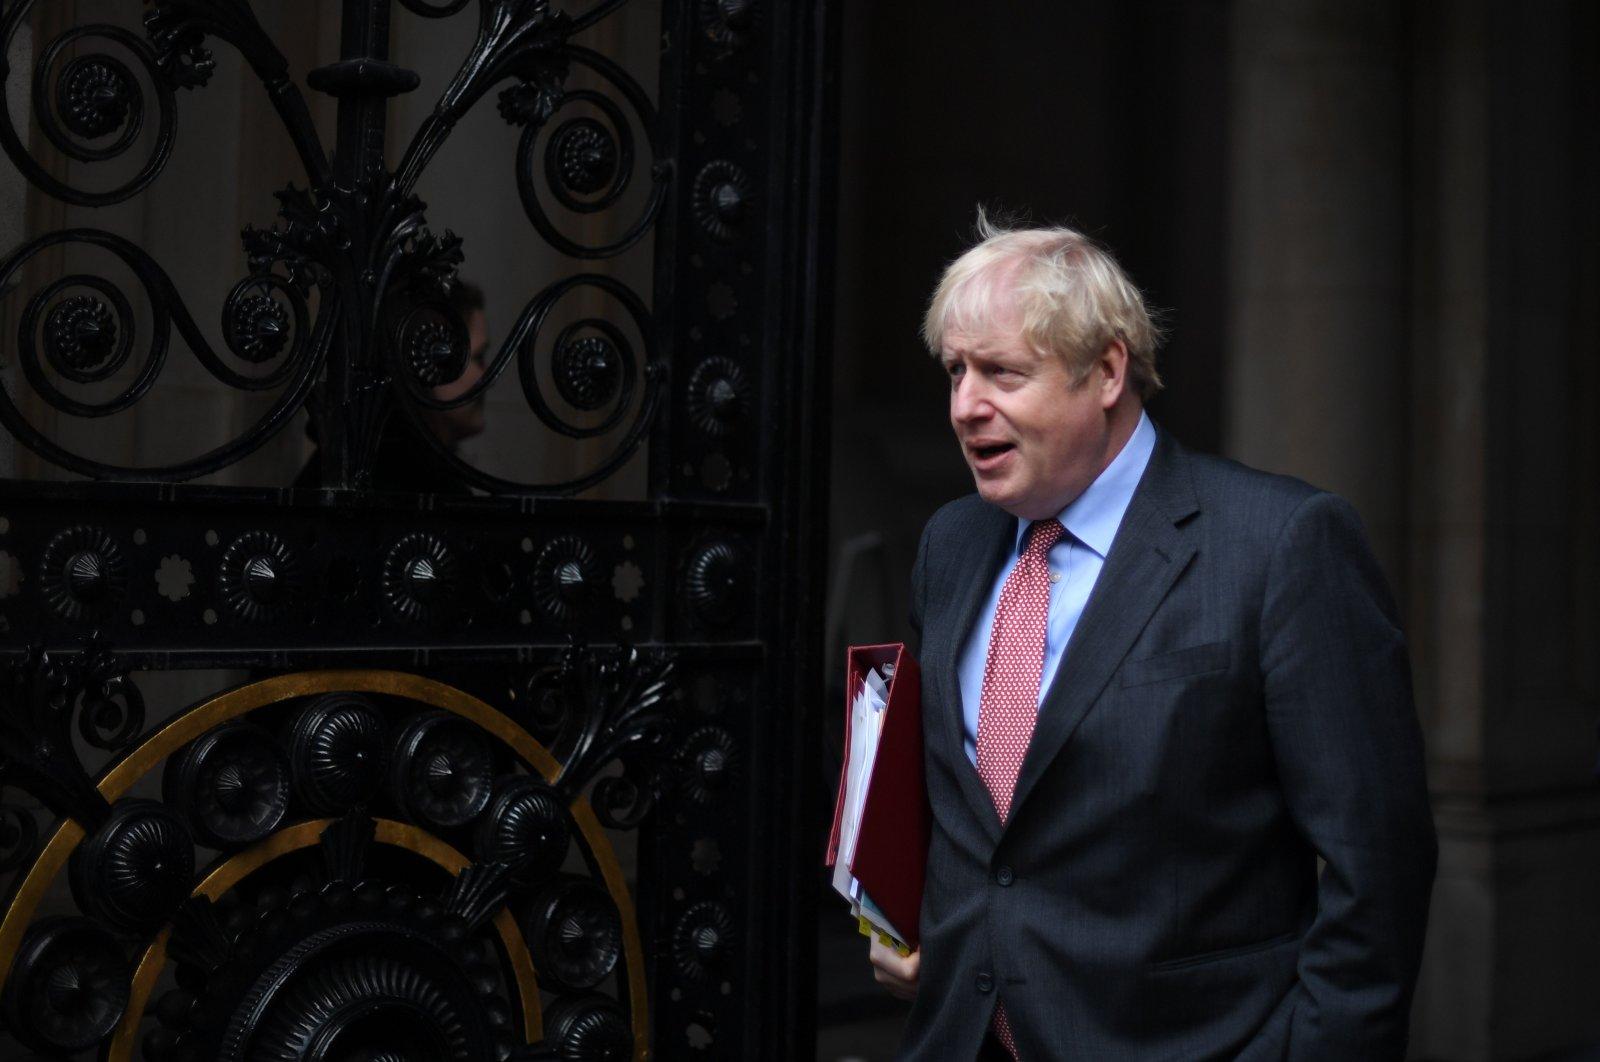 Britain's Prime Minister Boris Johnson returns to 10 Downing Street, London, Dec. 8, 2020. (AFP Photo)